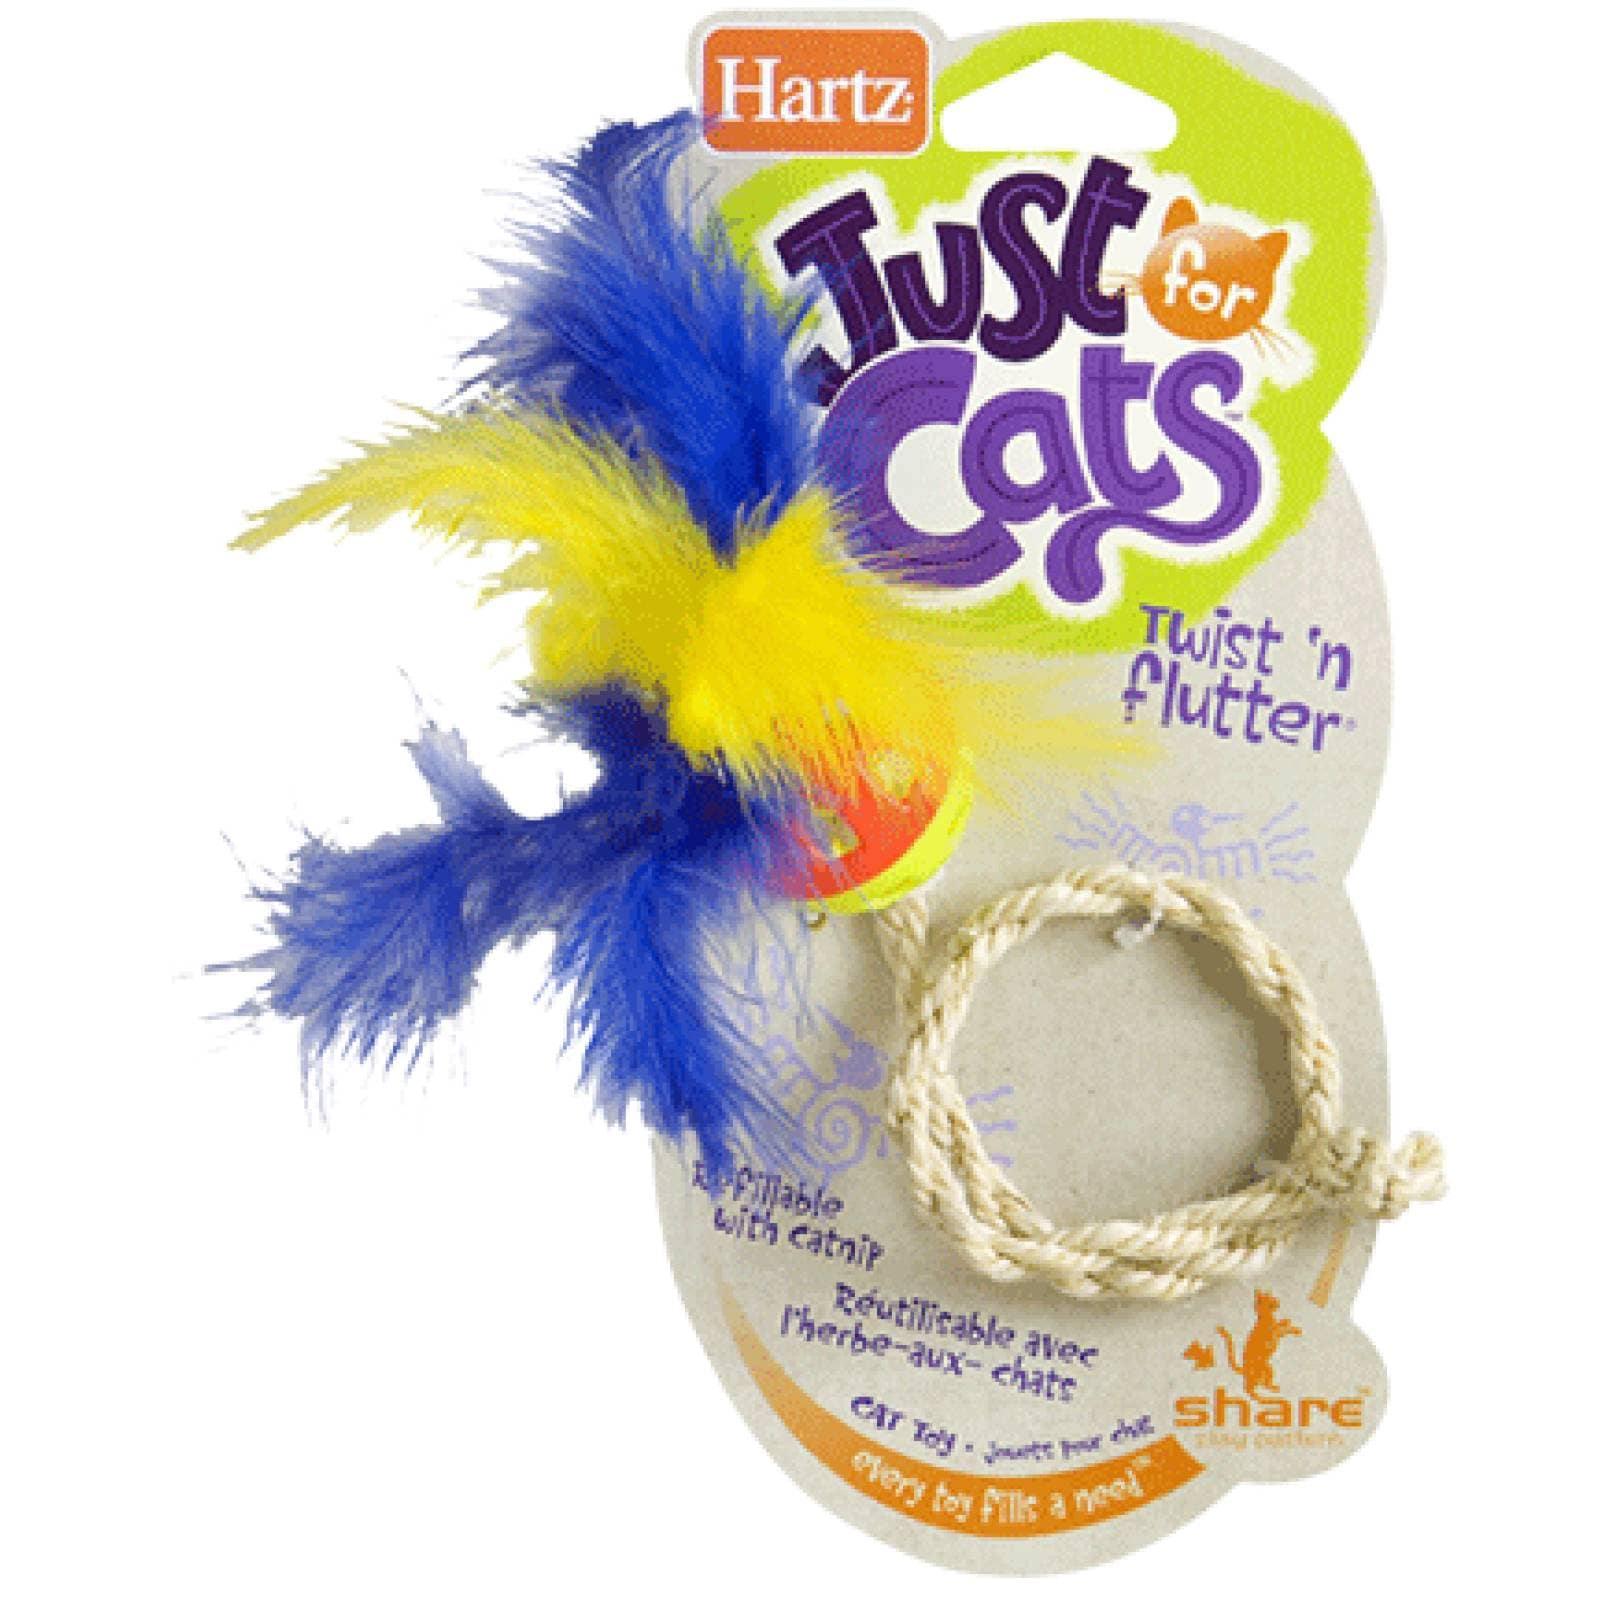 Hartz Juguete para Gato Just for Cats Twistn Flutter